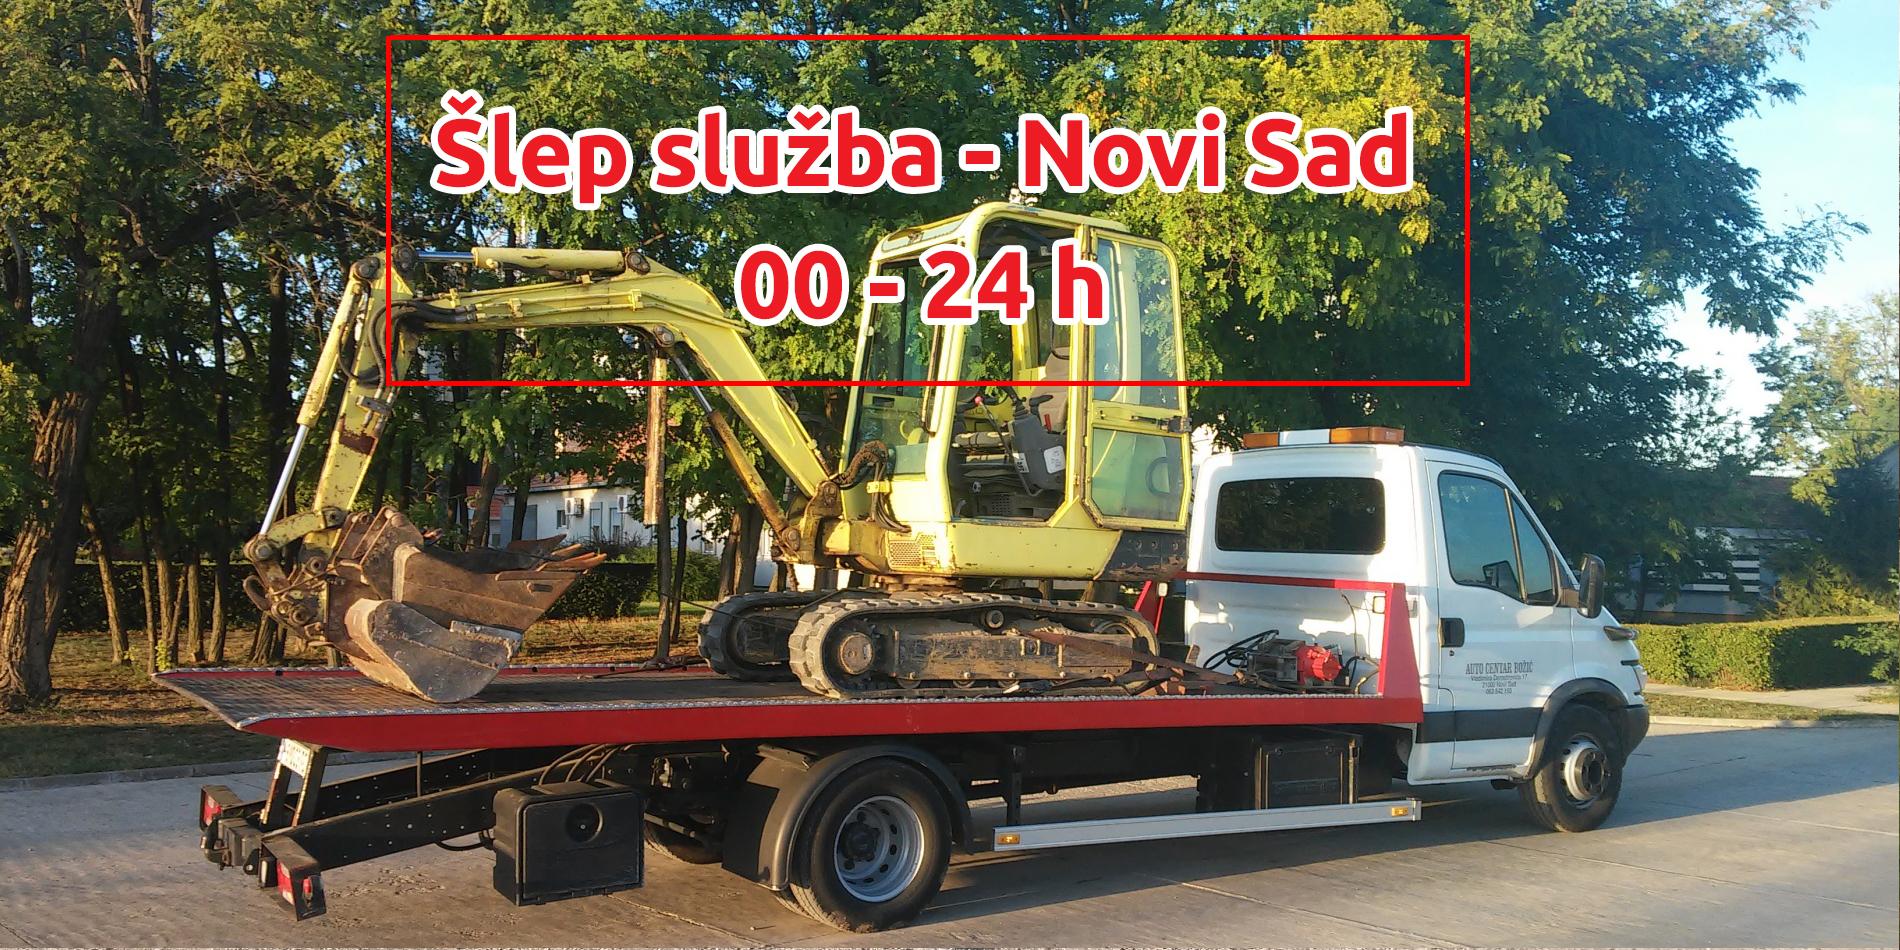 slep-sluzba-bozic-novi-sad-11